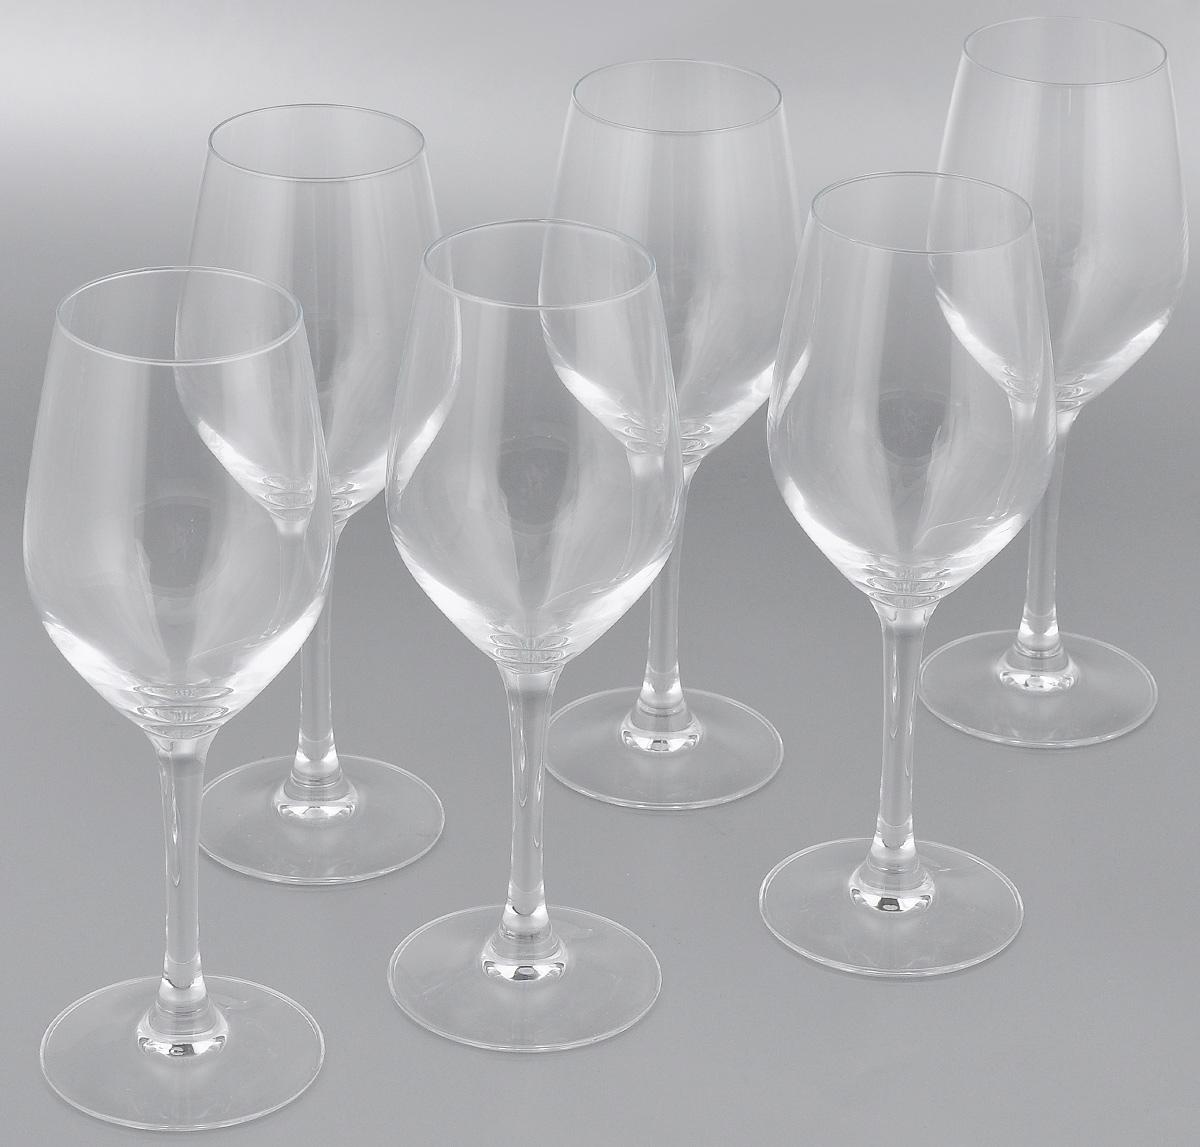 Набор фужеров для вина Luminarc Hermitage, 270 мл, 6 шт набор фужеров для вина luminarc imperator 170 мл 3 шт